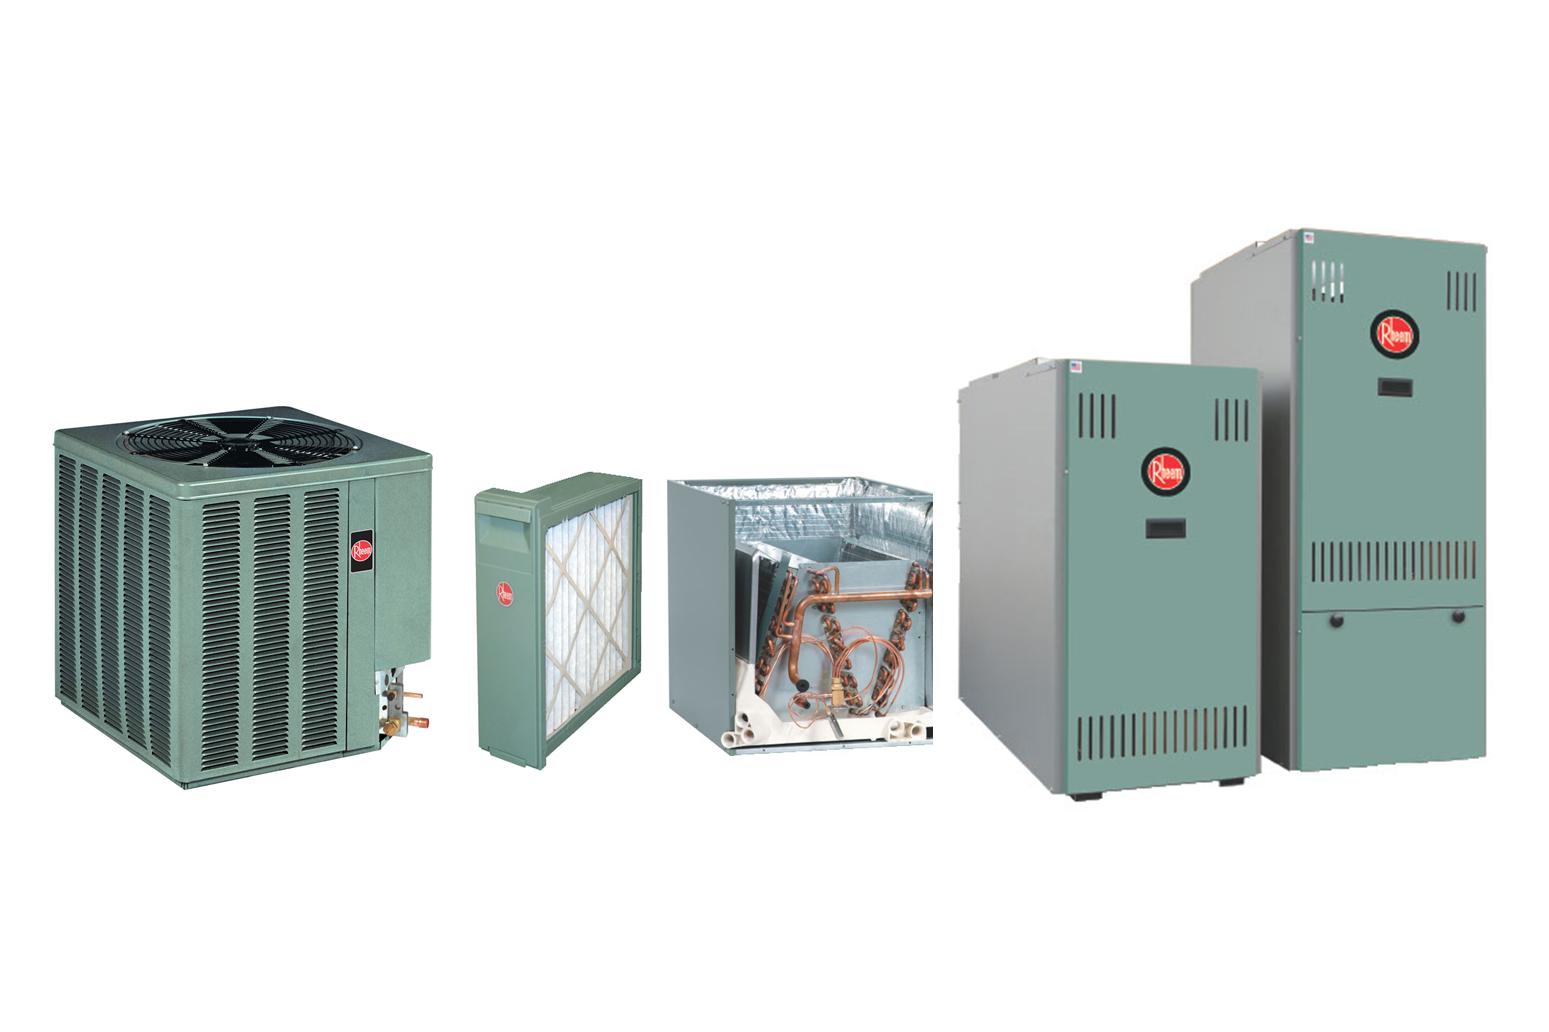 Amana Heating and Resetowania hasła bet at home bet at home kod Descargar bet at home app bonusowy czerwiec 2016 Air Conditioning Wall Units